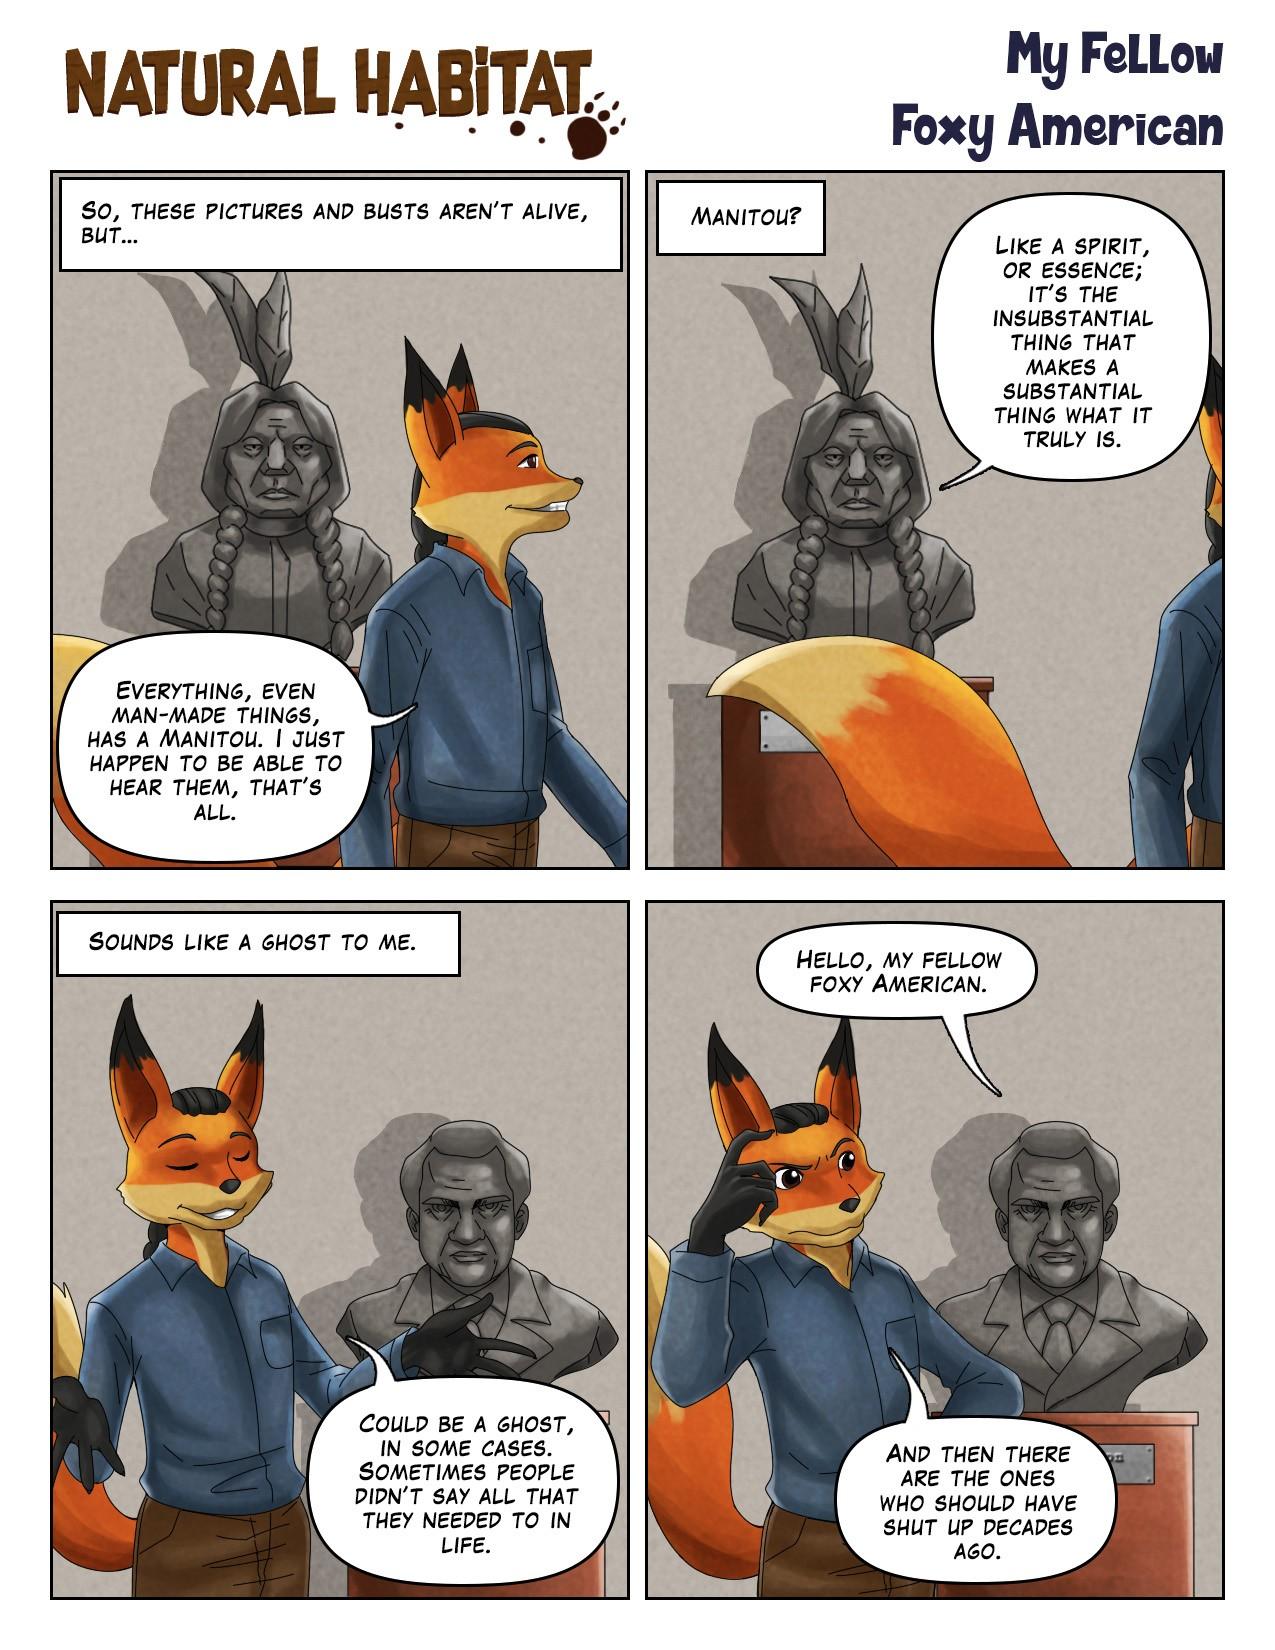 My Fellow Foxy American